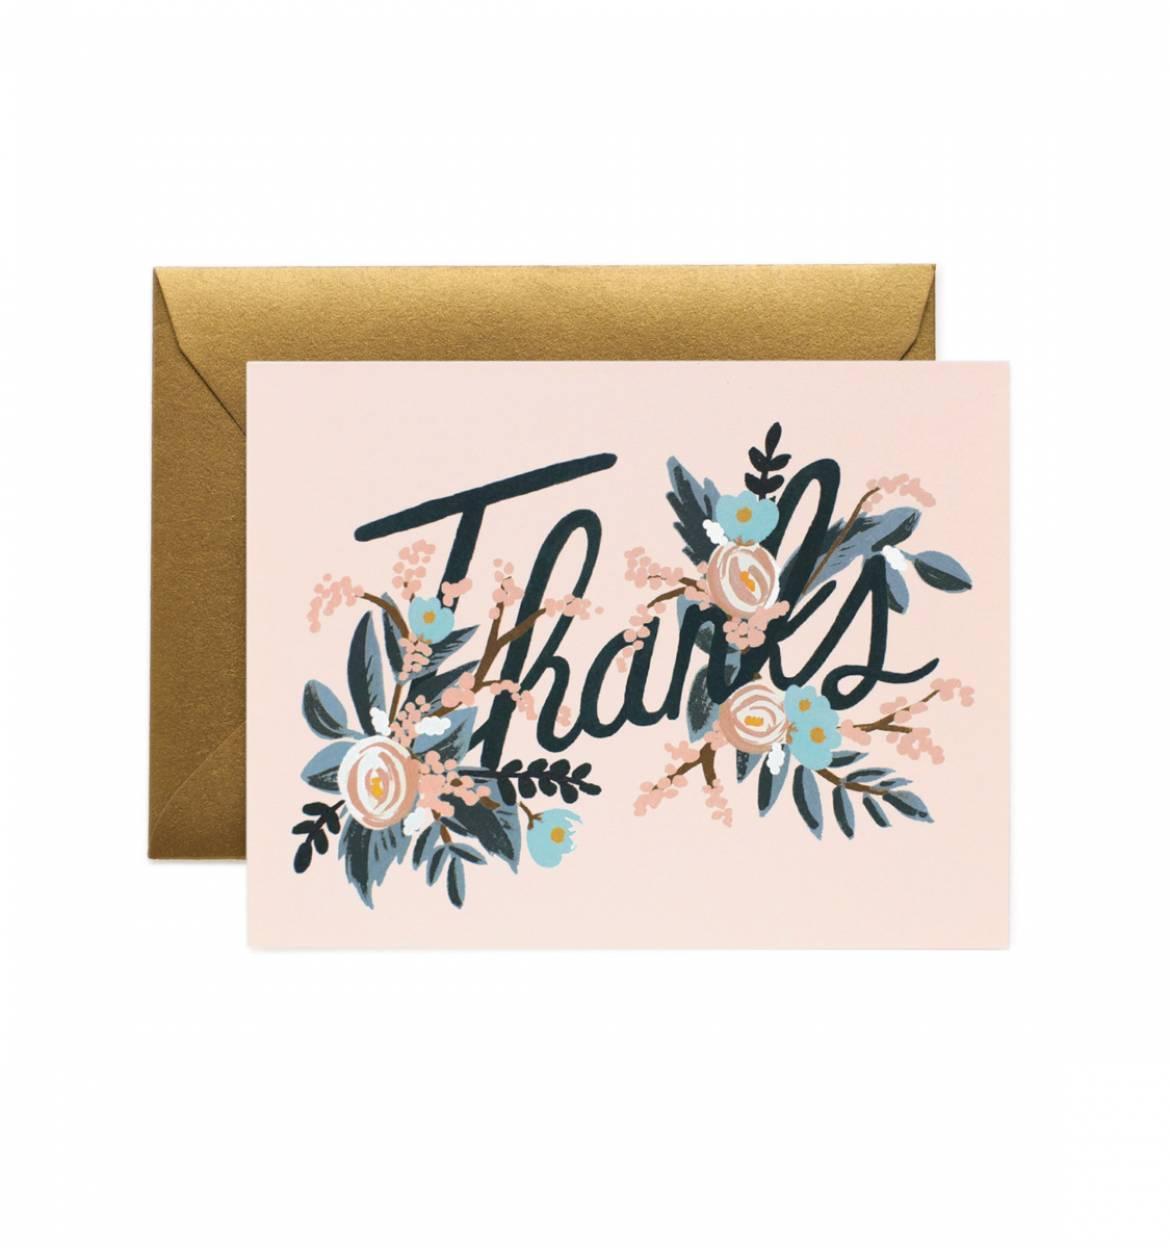 woodland-thank-you-greeting-card-01_2.jpg